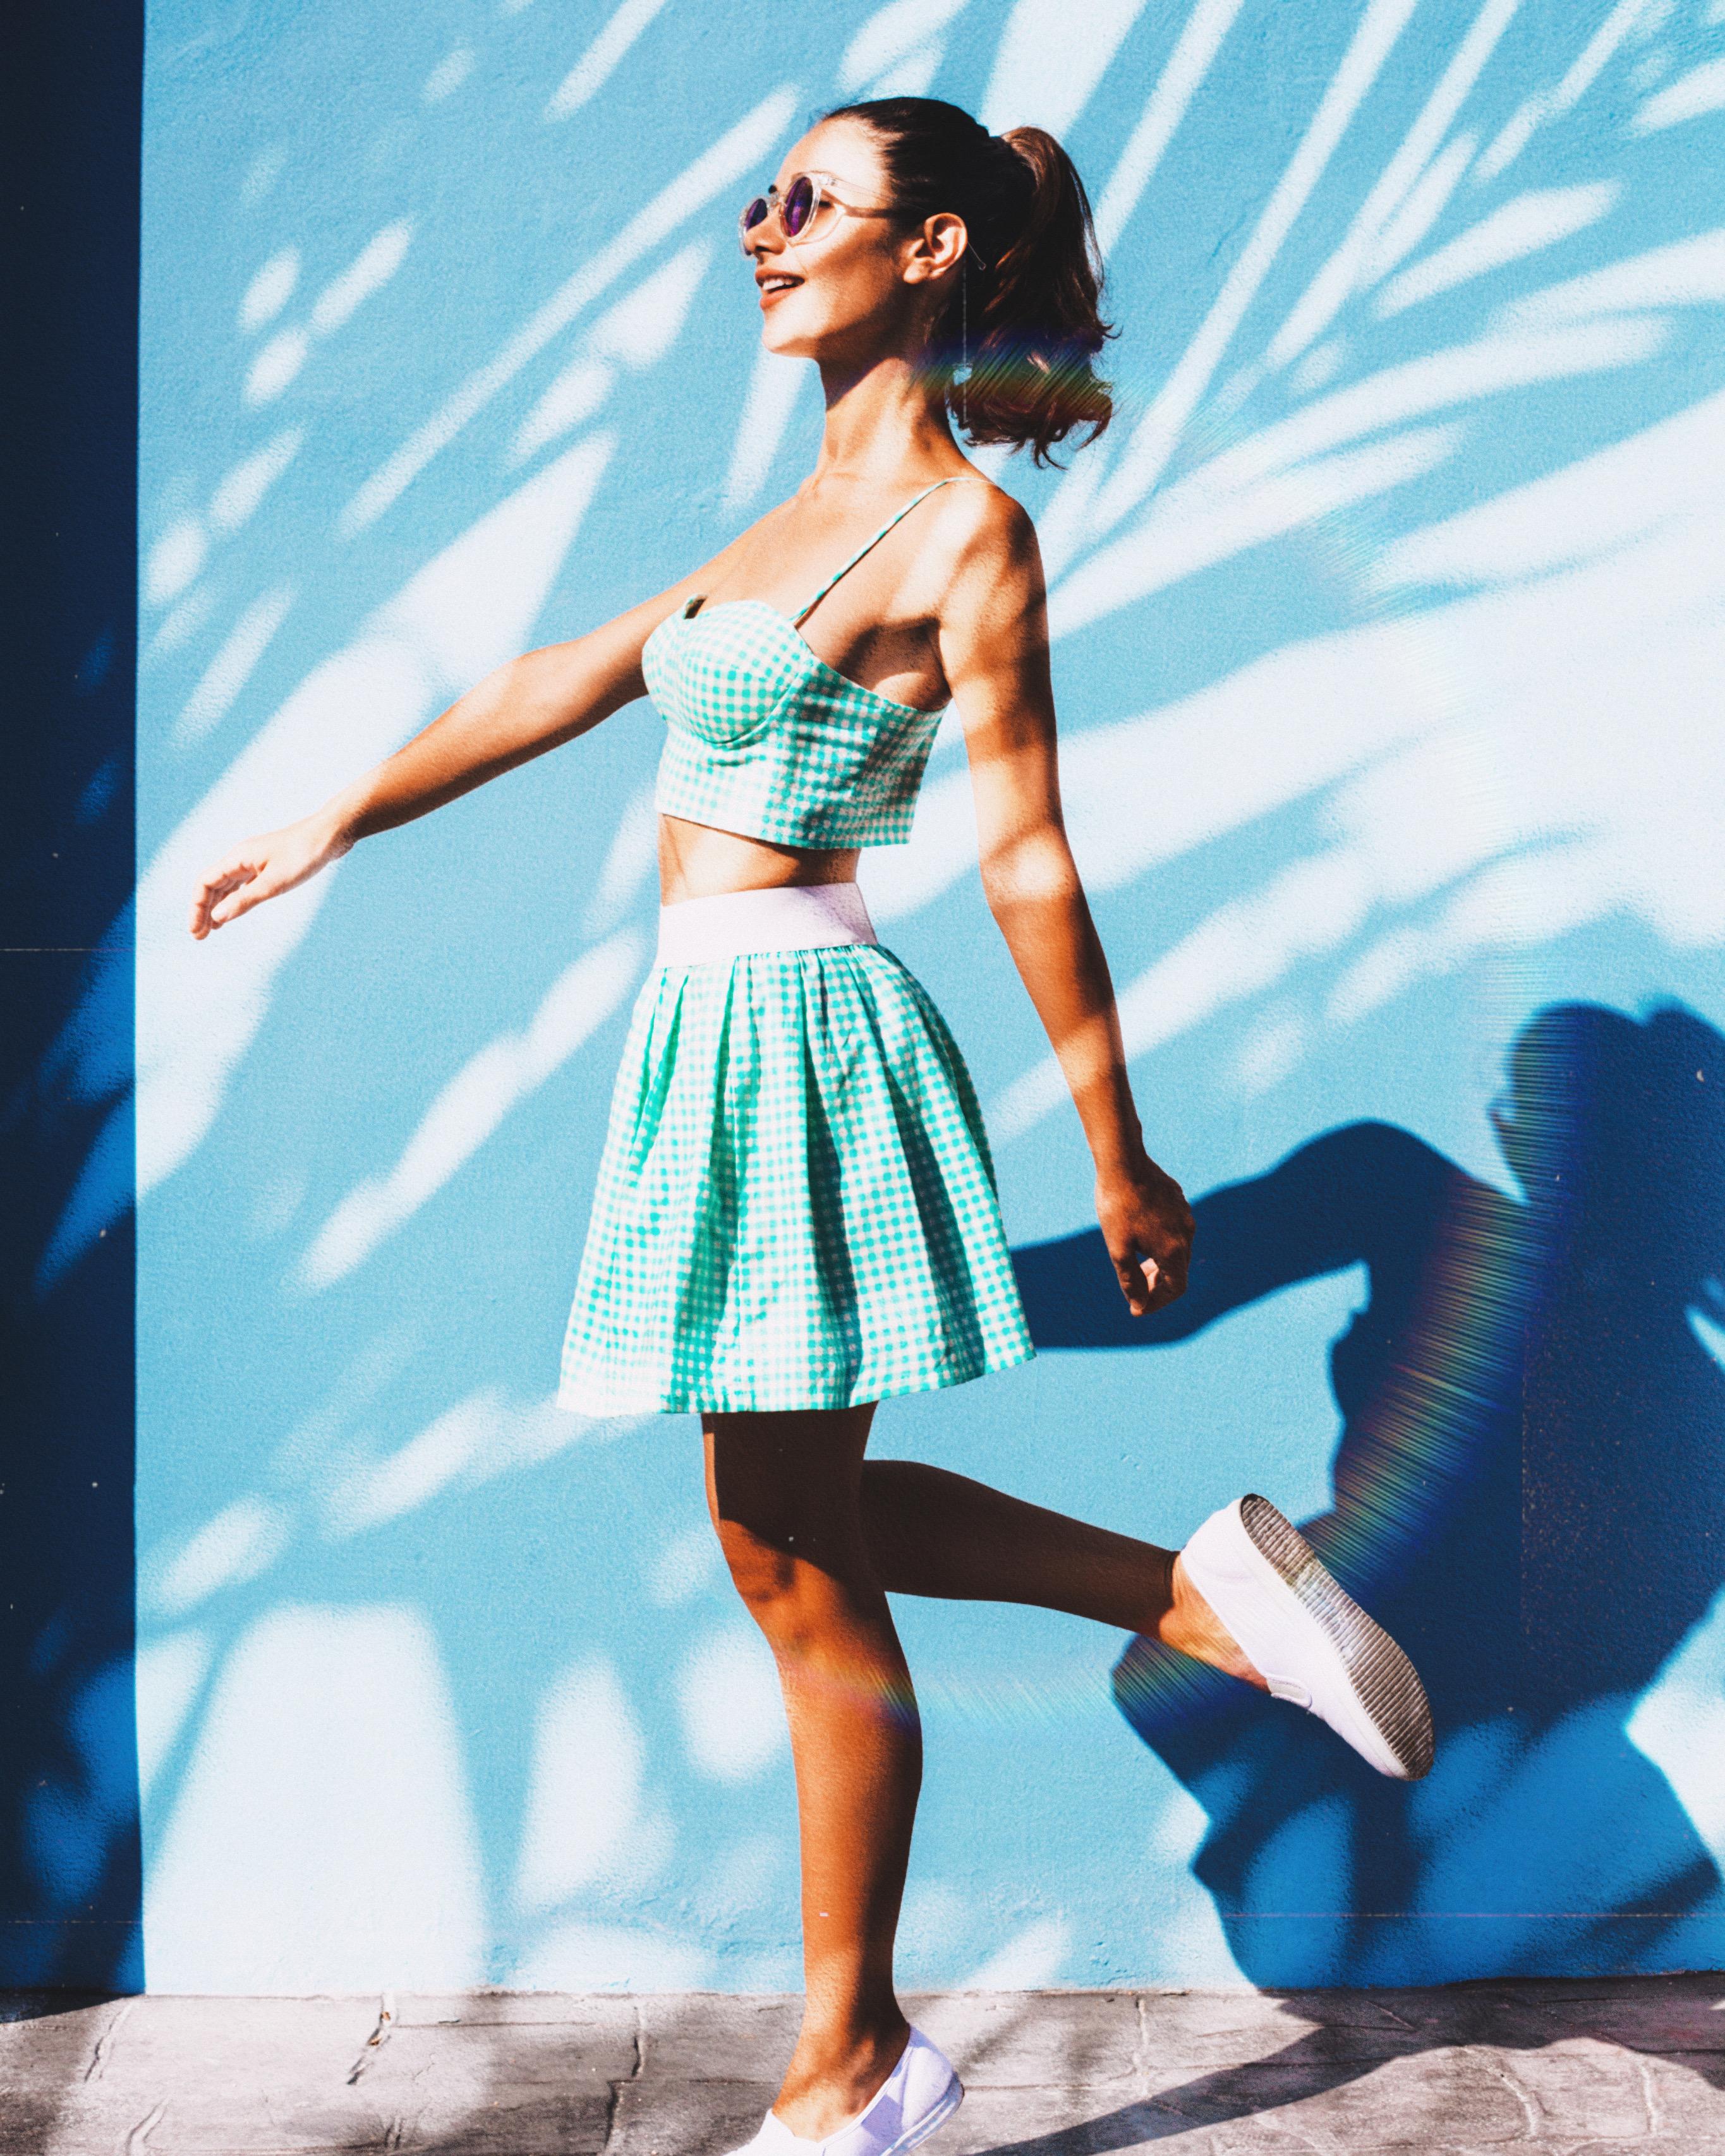 #freetoedit #shadow #shadowart #light #blinds #shadowplay #palmtrees #summer #prismeffect